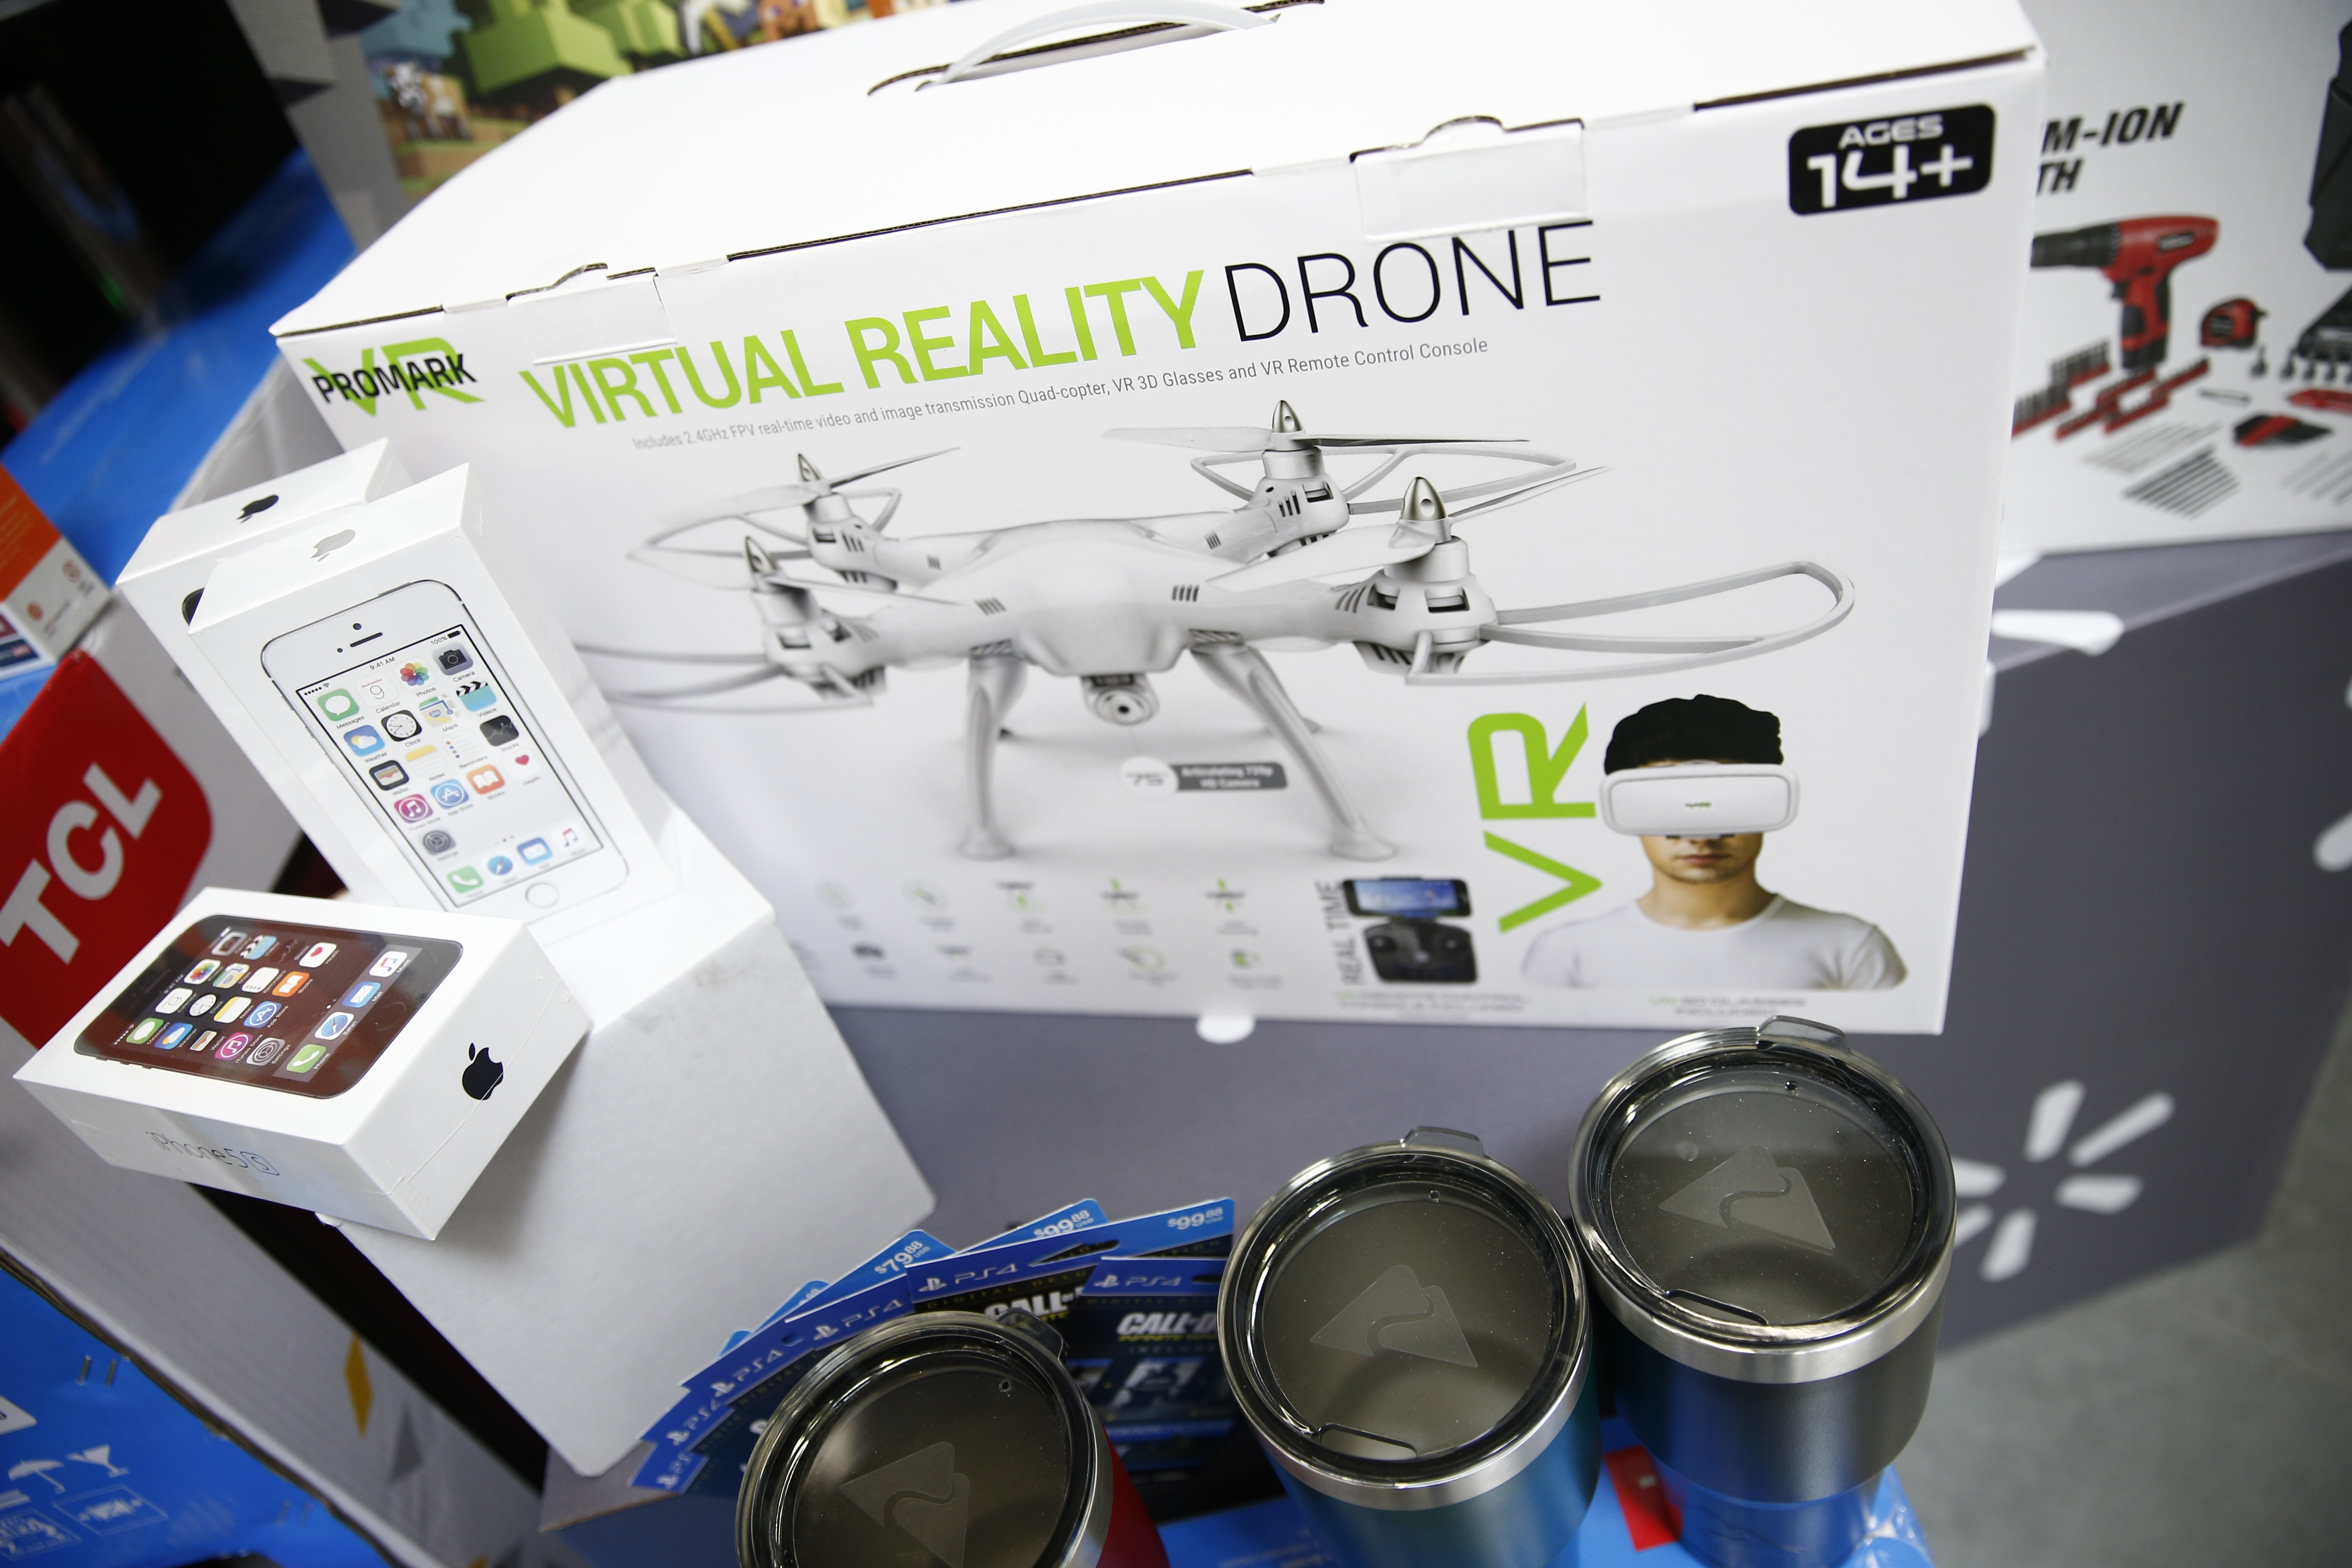 Virtual Reality Drone